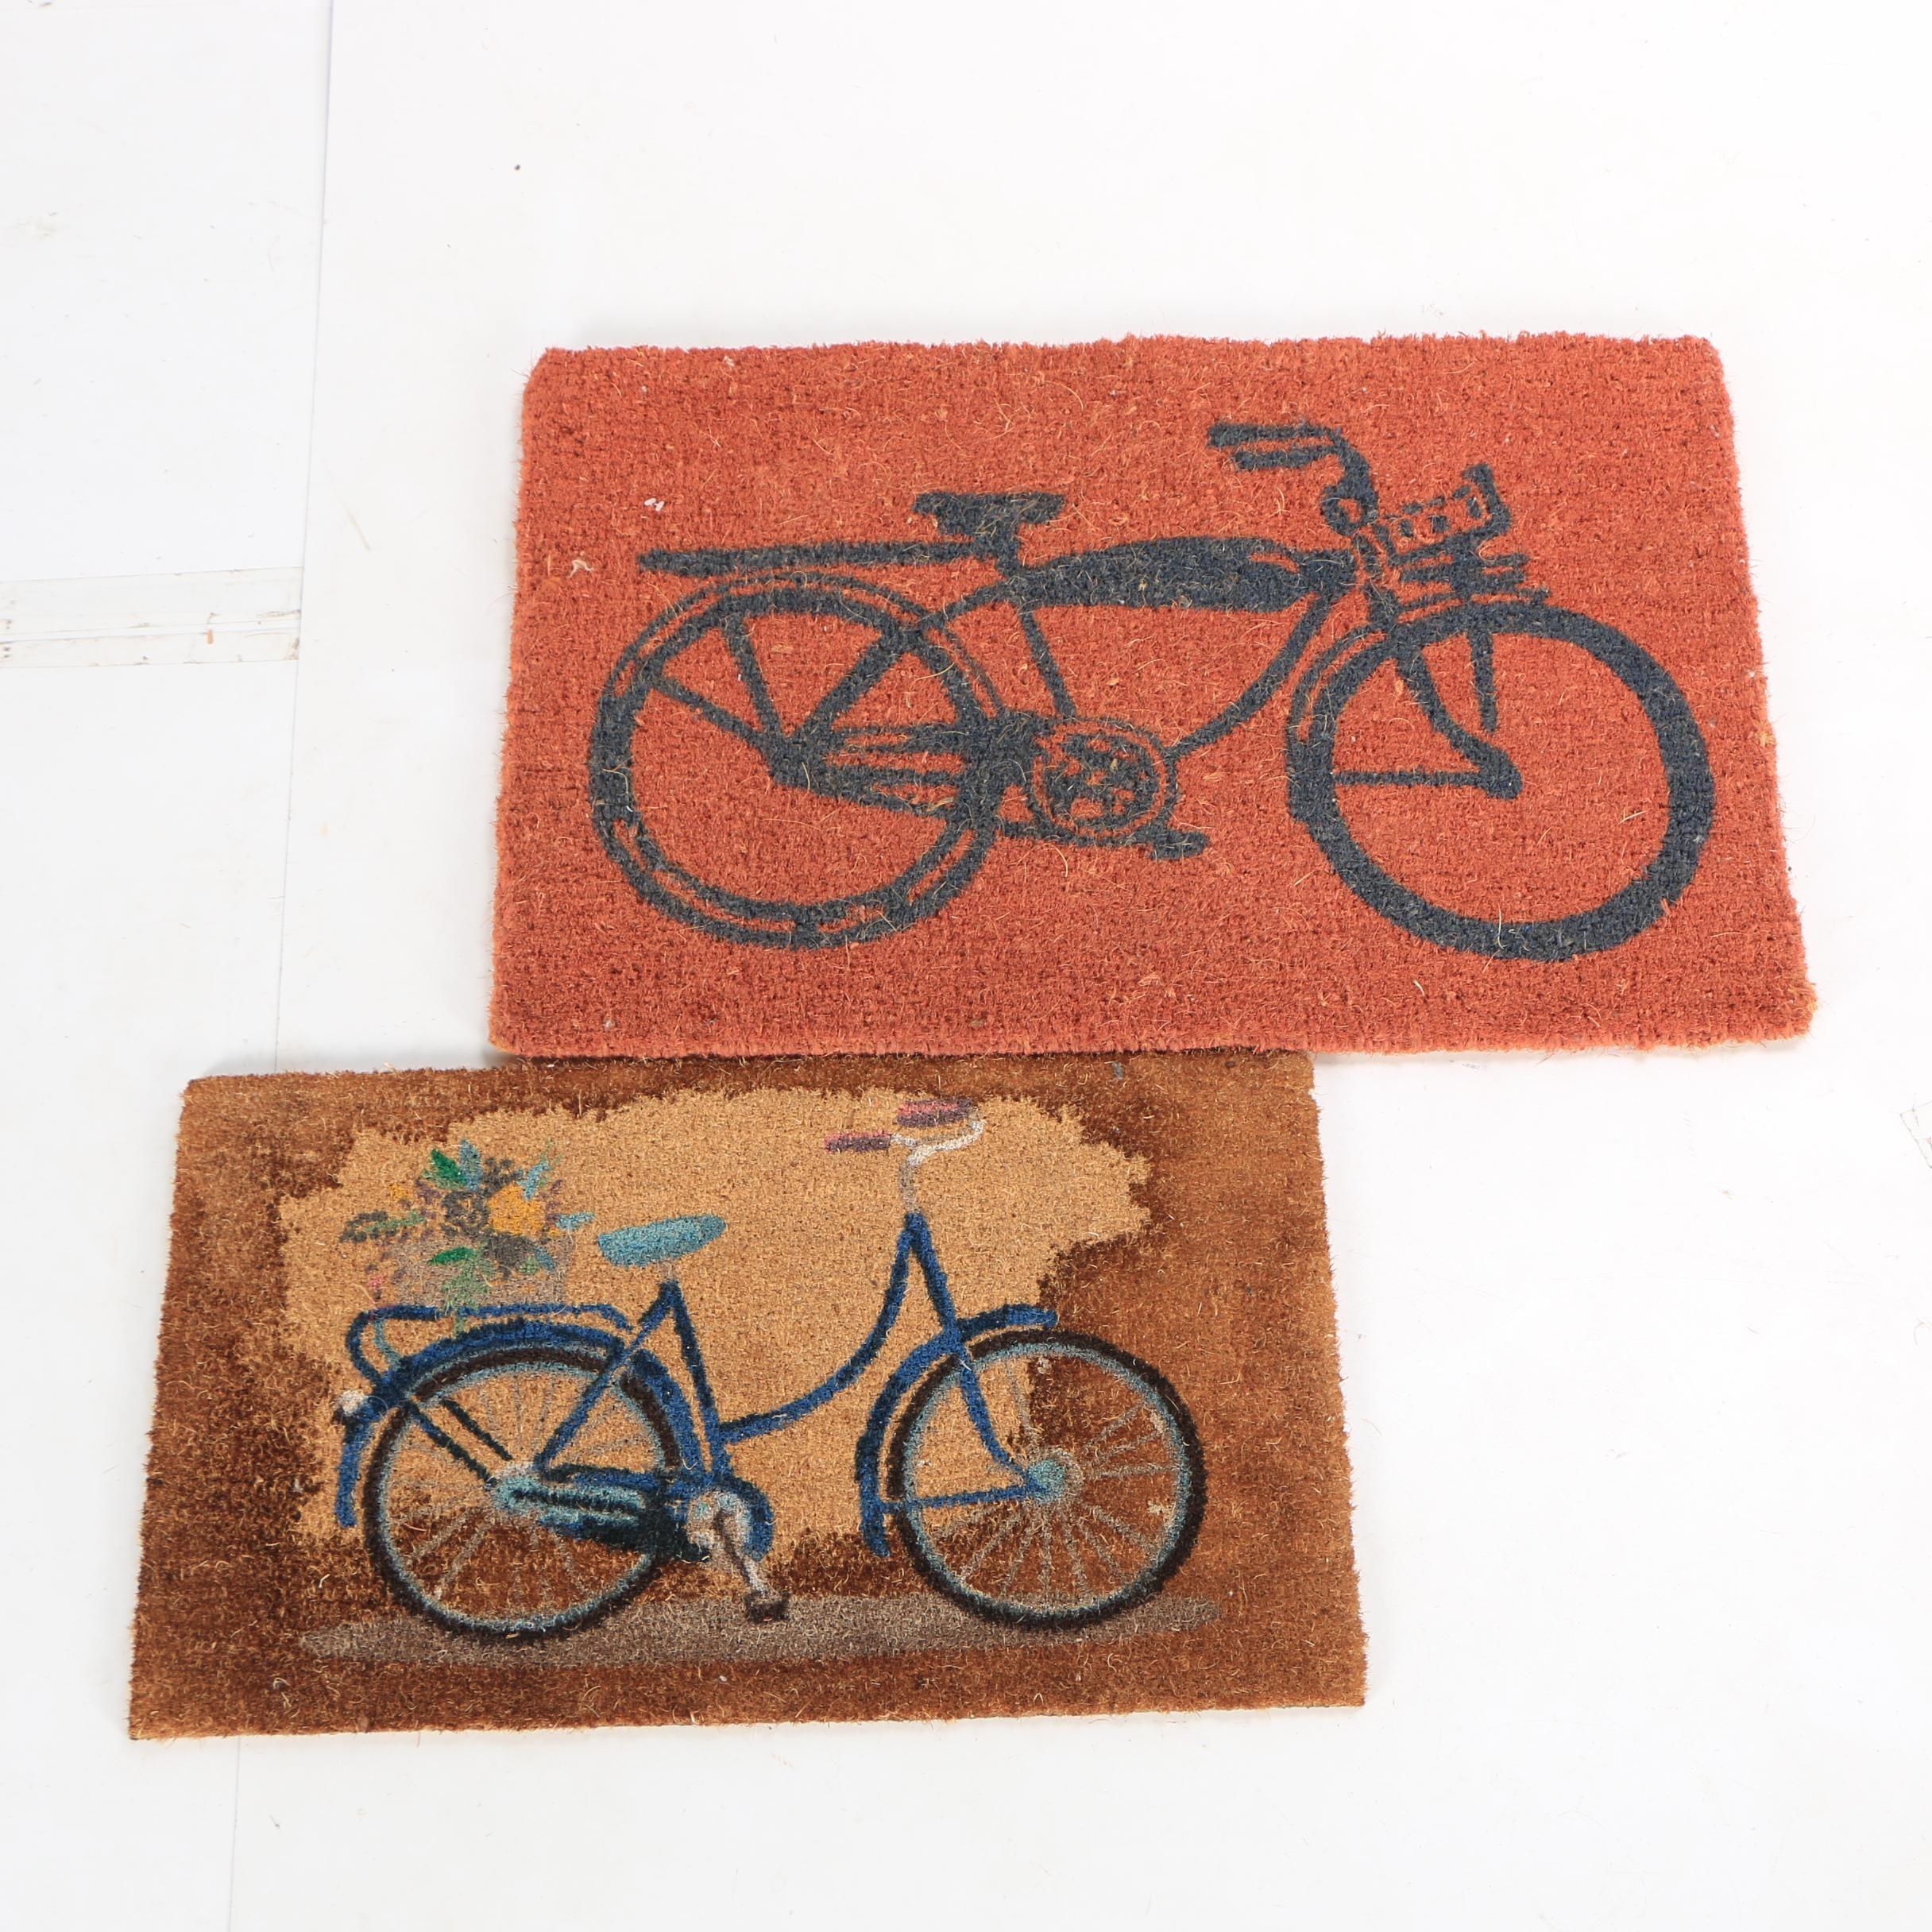 Bicycle-Themed Sisal Doormats